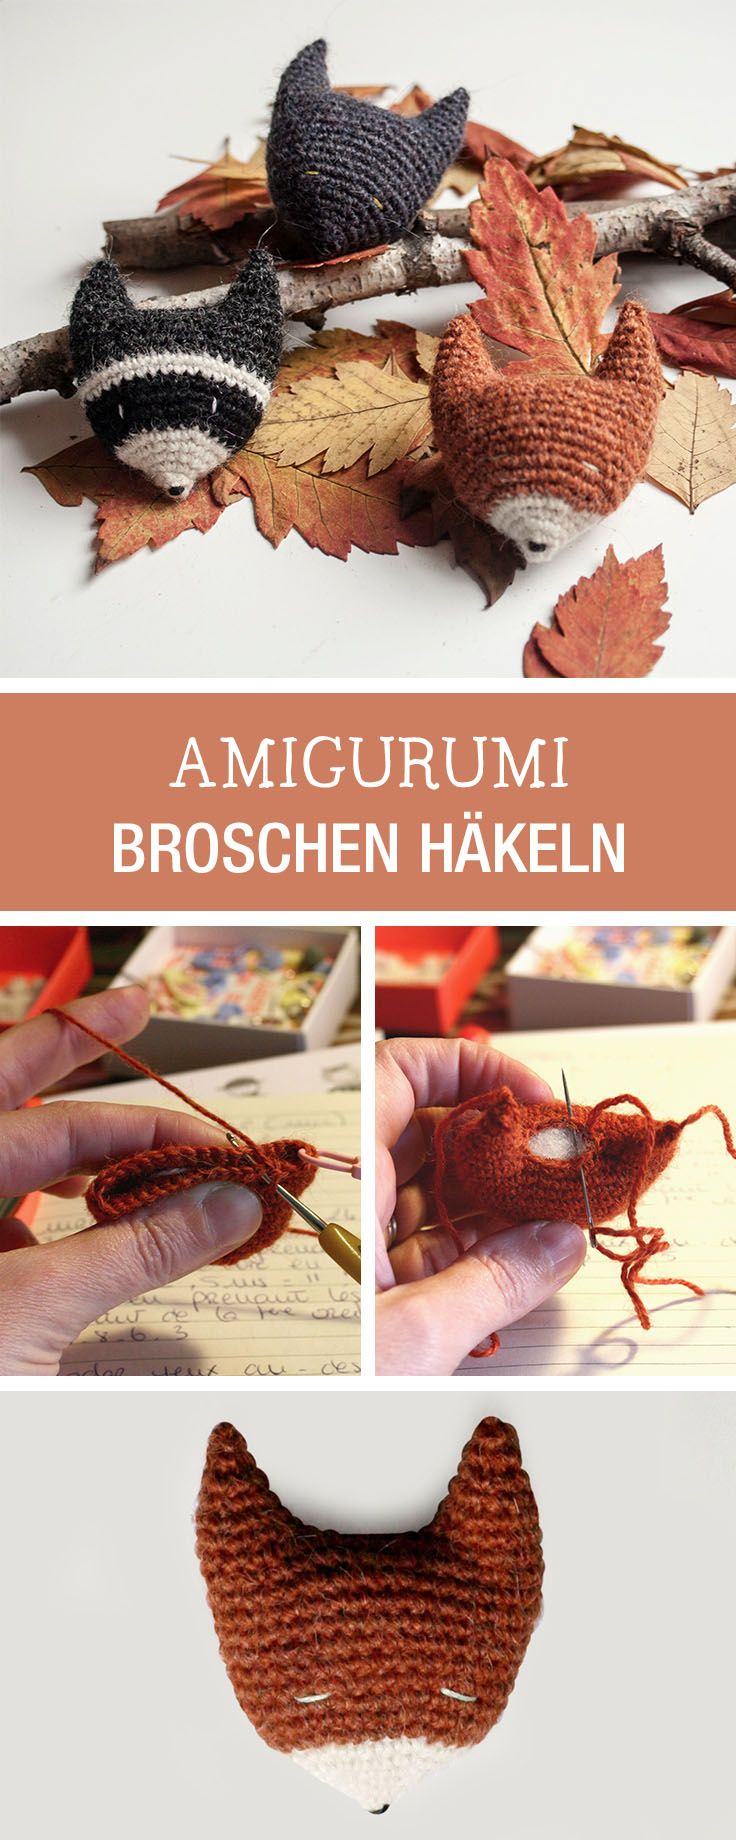 DIY-Anleitung: Deine Herbstdeko selbstgemacht, Amigurimi Broschen als Fuchs häkeln / DIY tutorial: your fall handmade fall decor, crocheting Amigurumi brooch as fox via DaWanda.com